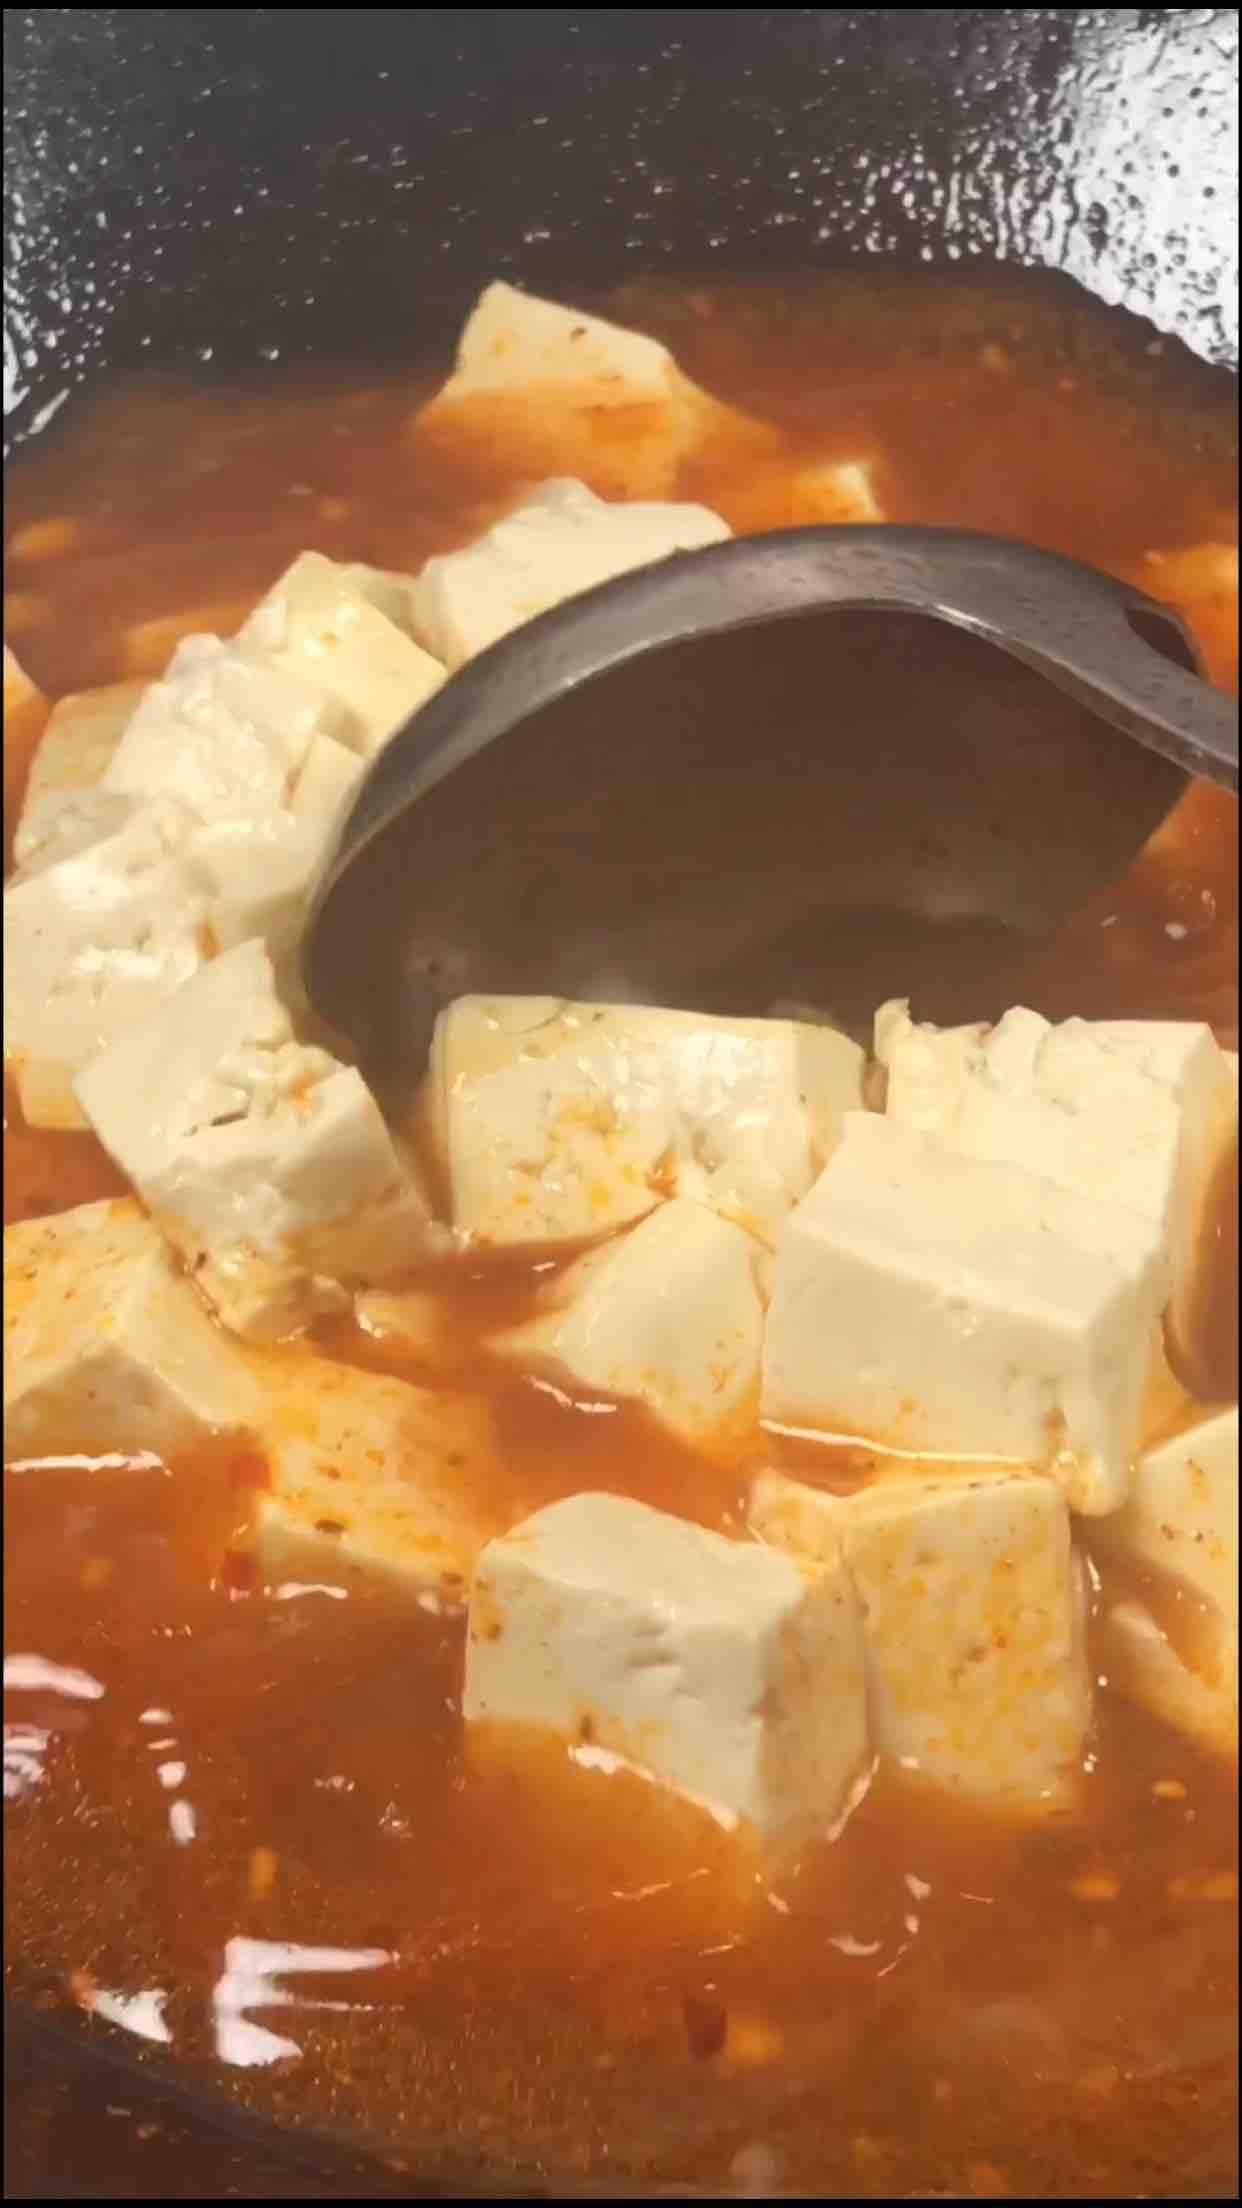 川味肉沫豆腐怎样炒